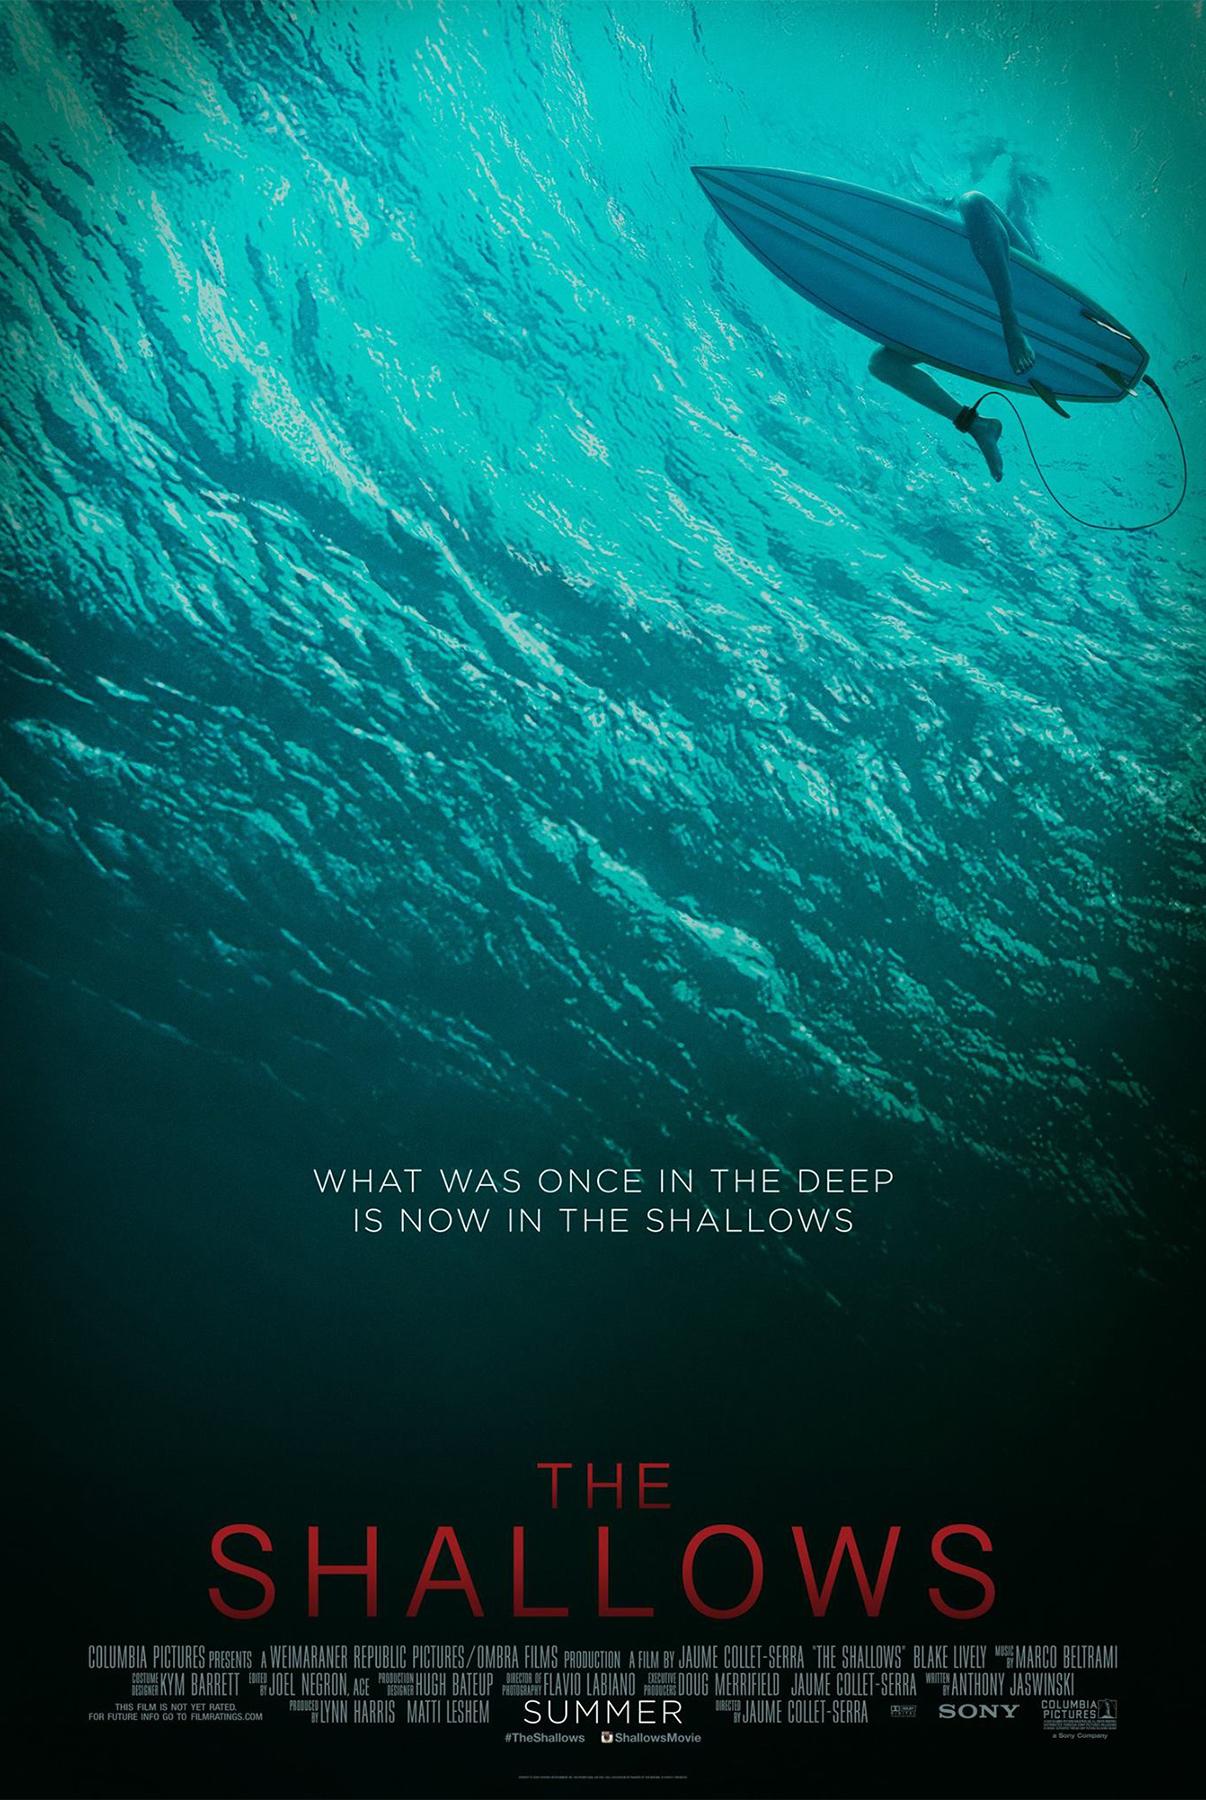 The Shallows (2016)